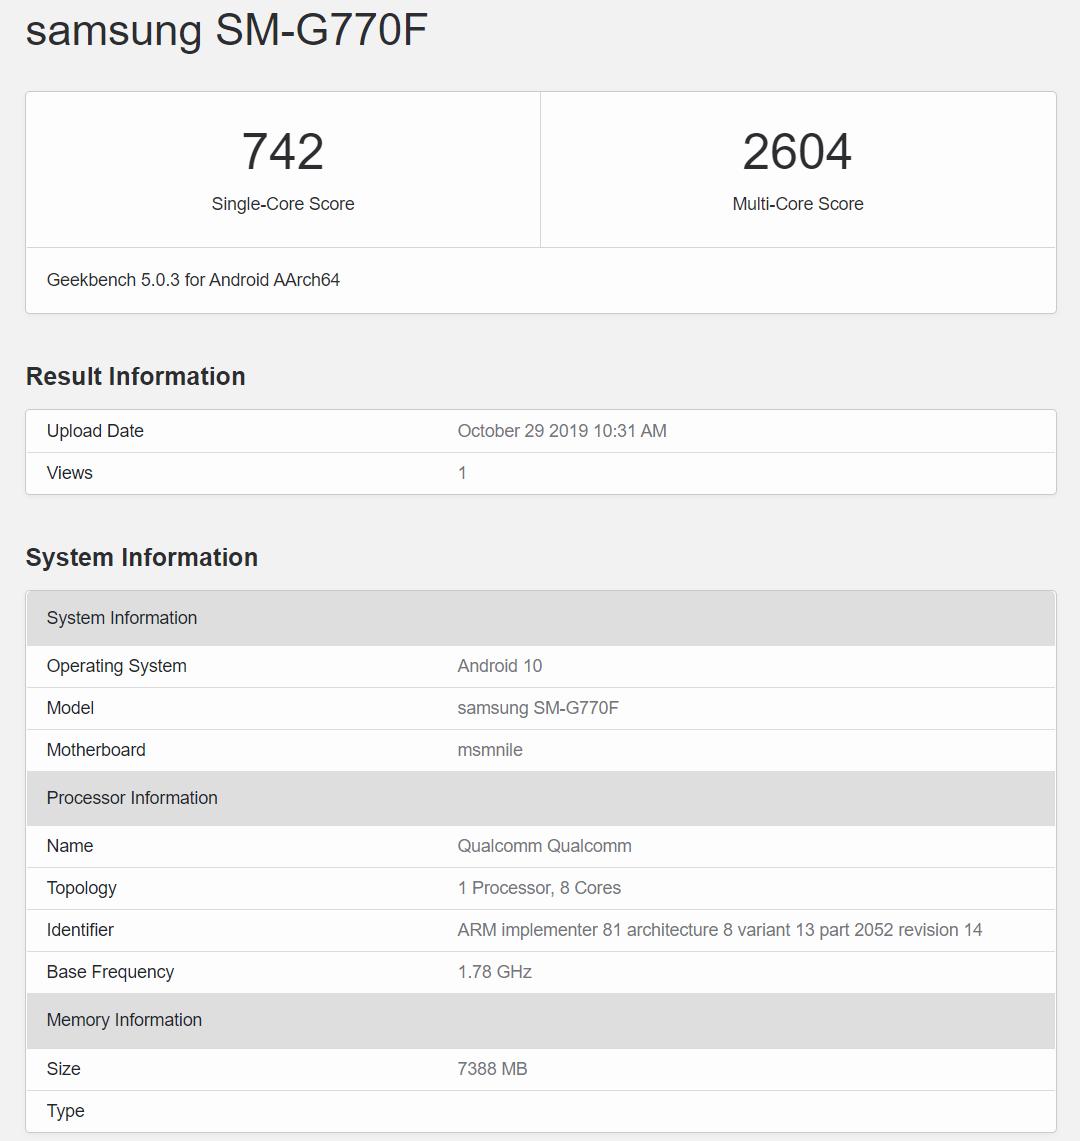 samsung sm-g770f geekbench